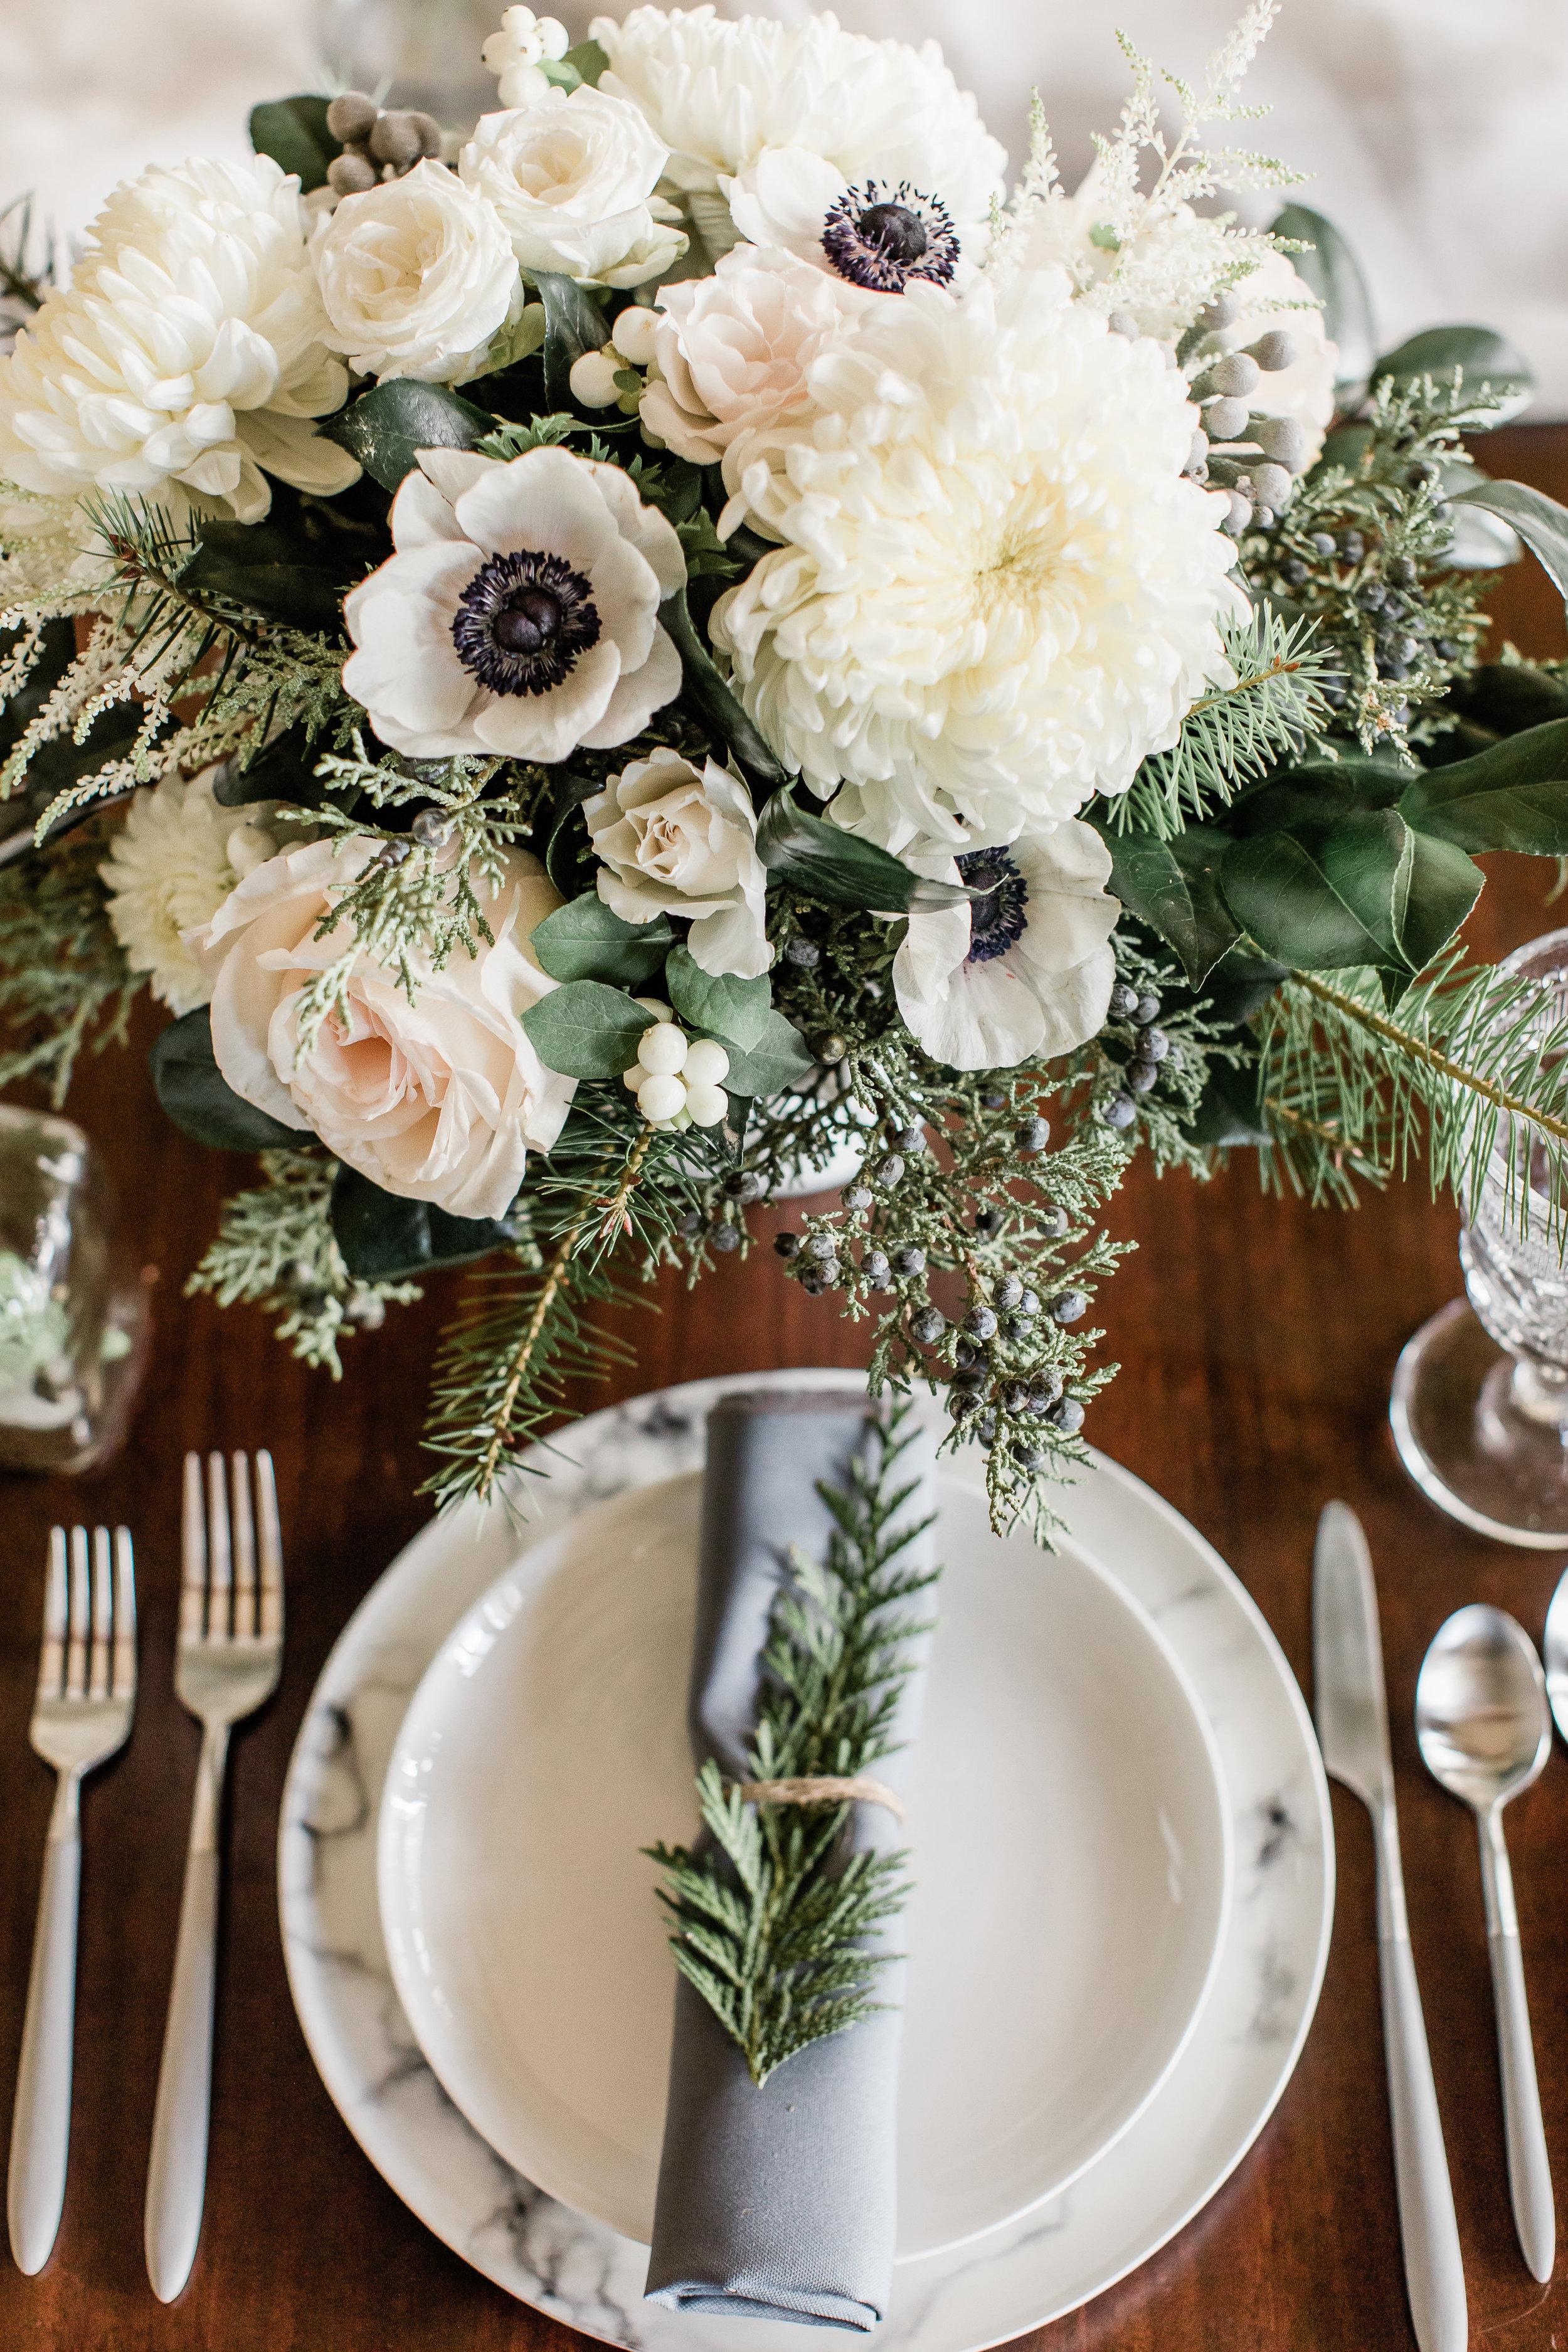 Winter_Wedding_Florals_Tablescape_Des_Moines_Iowa_Sibyl_Sophia.jpg